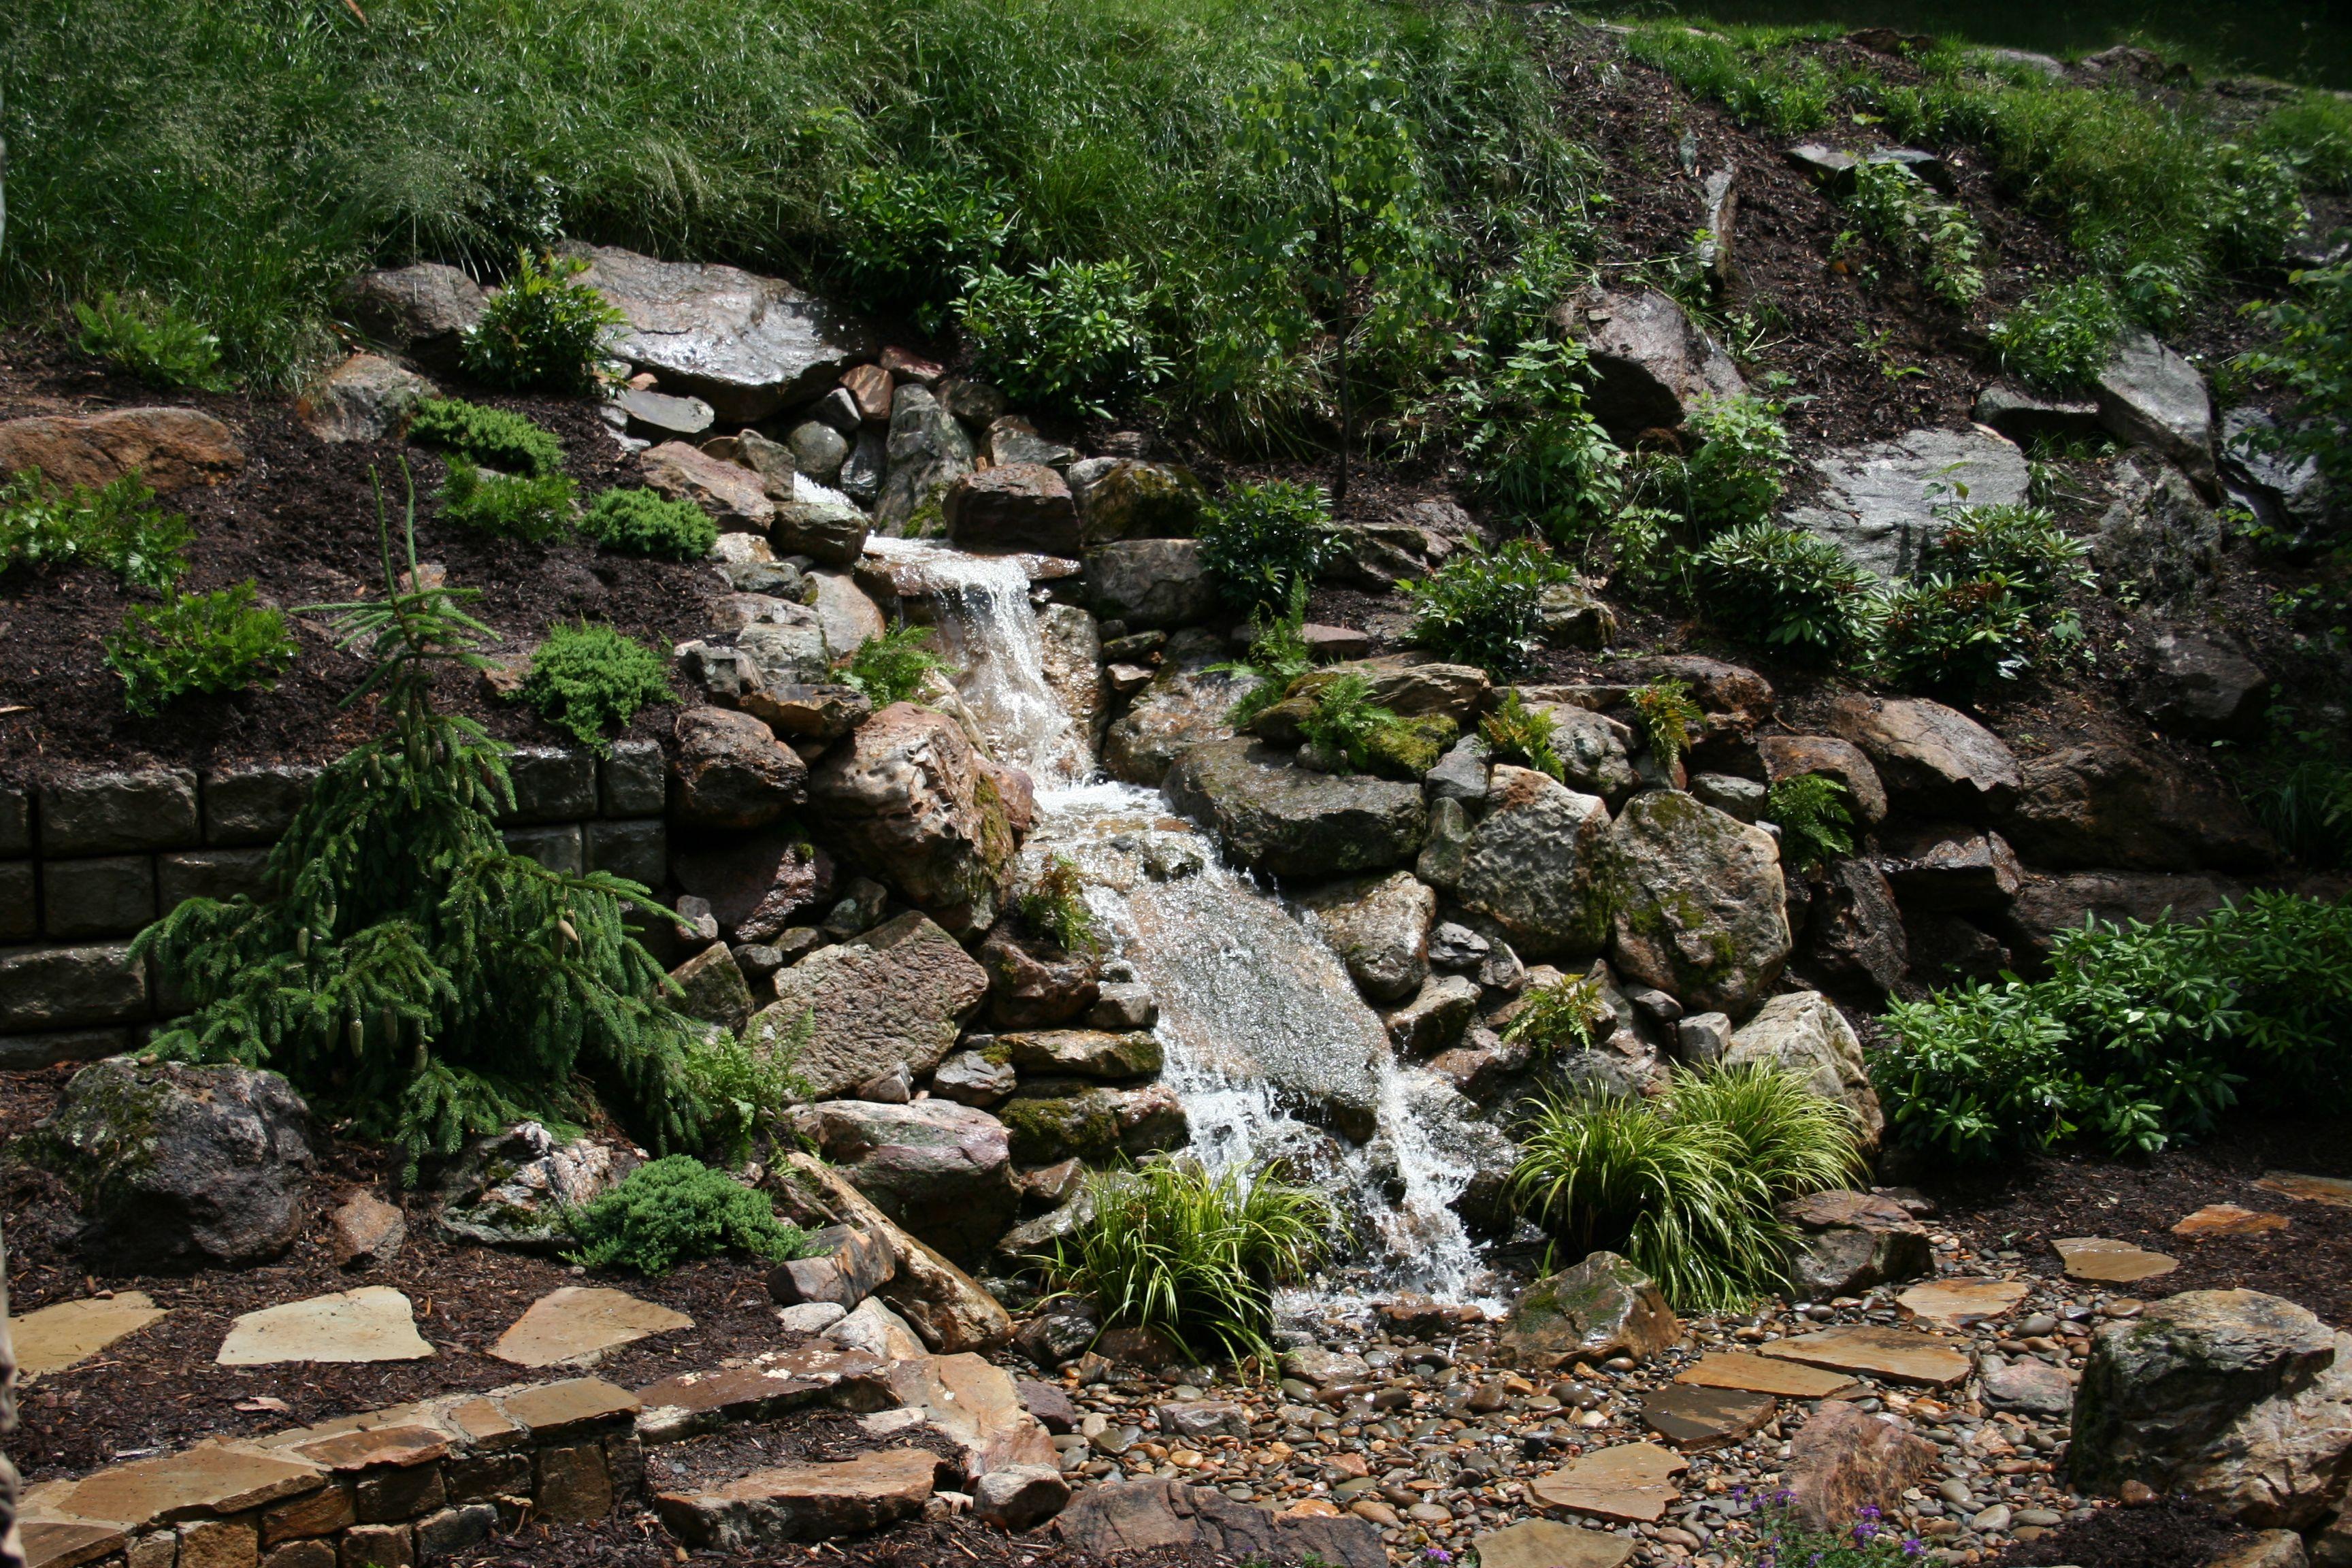 Pondless waterfall garden waterfalls pinterest for Pondless waterfall